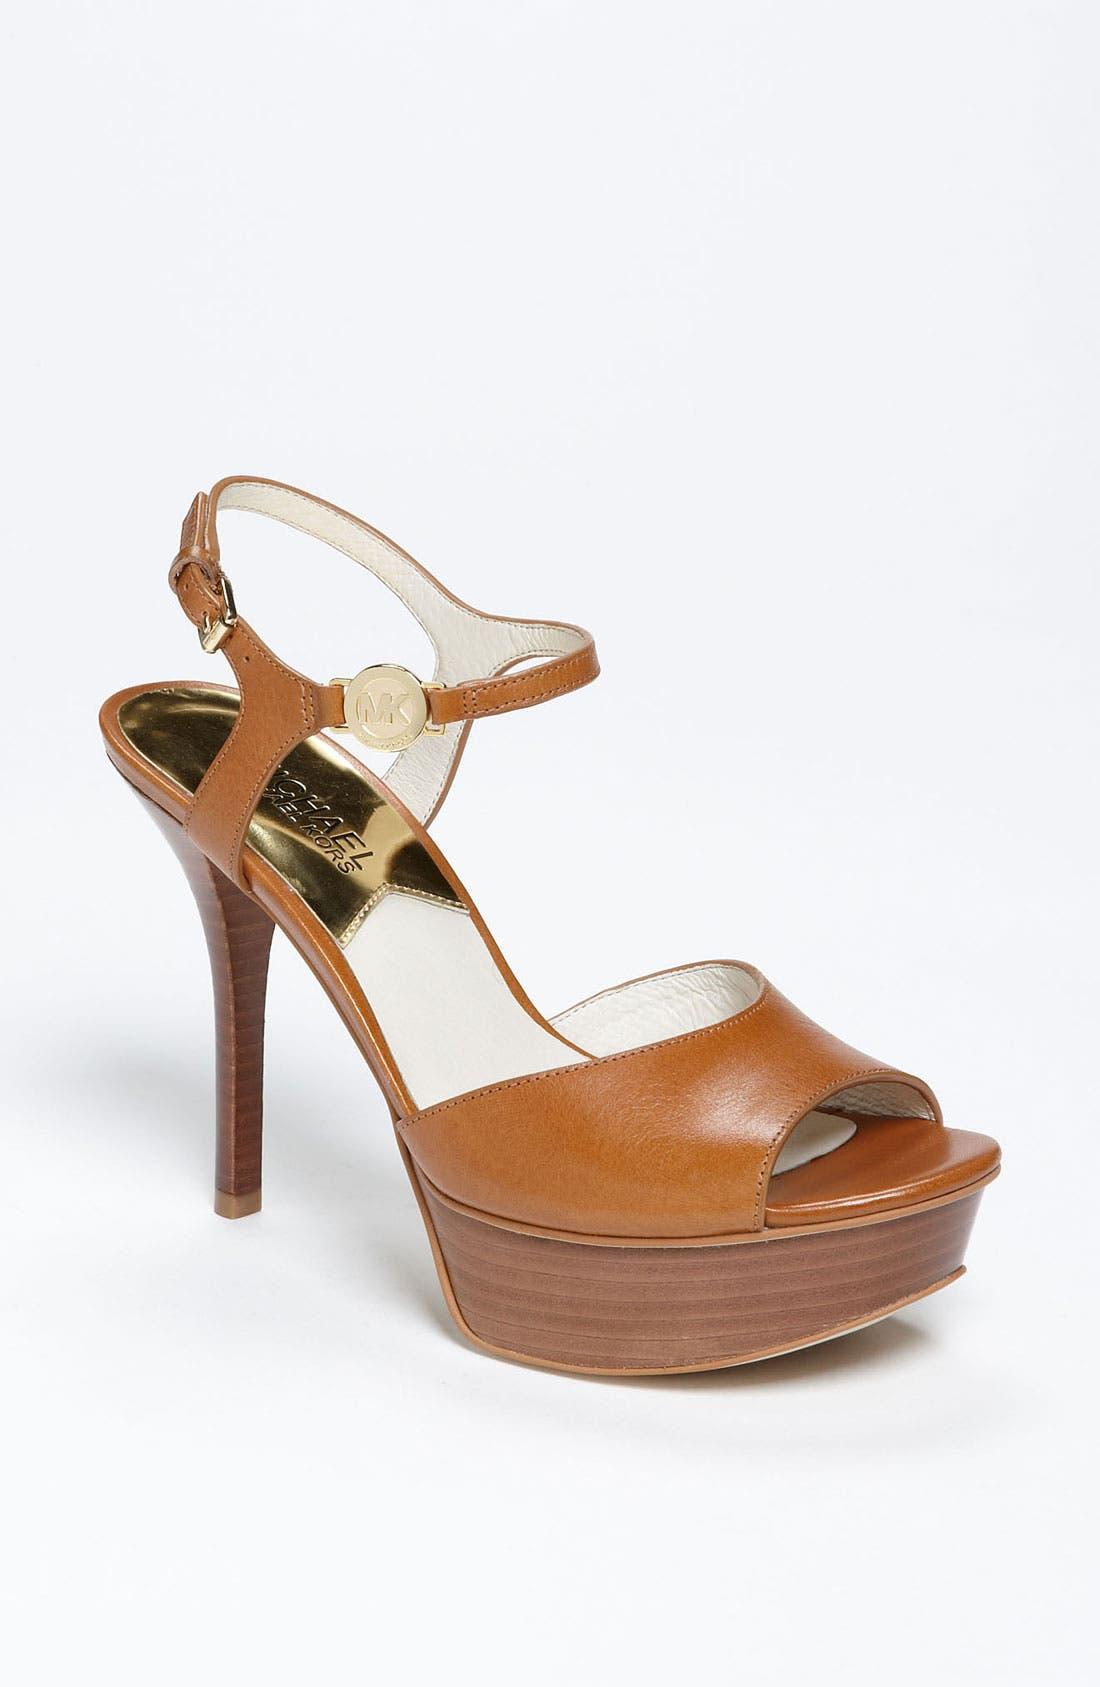 Main Image - MICHAEL Michael Kors 'Brayson' Sandal